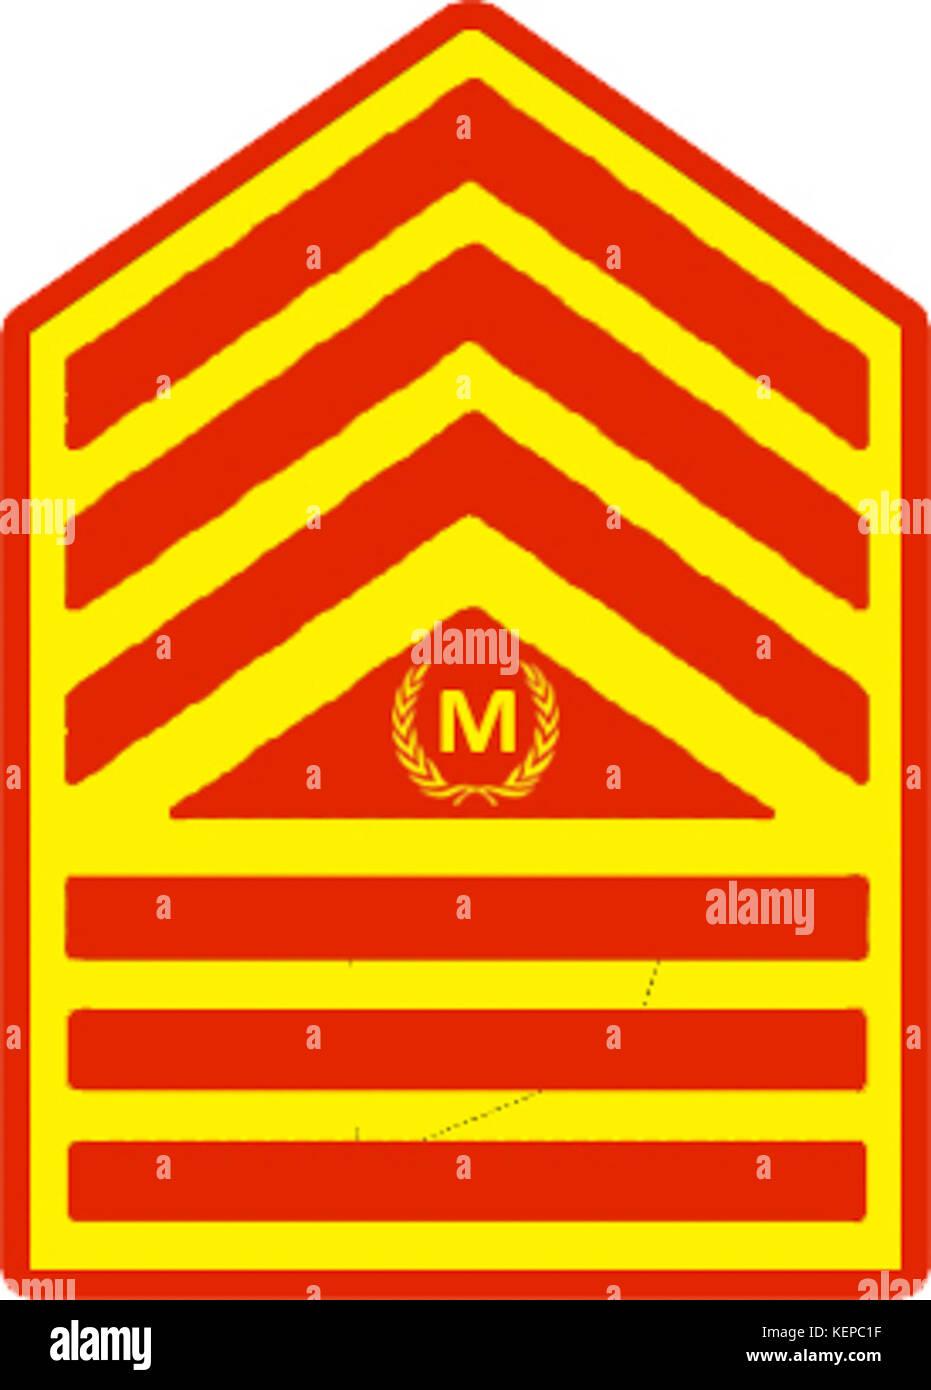 Command sergeant major stock photos command sergeant major stock philippine marine corps master sergeant rank insignia designated as command sergeant major stock image buycottarizona Image collections